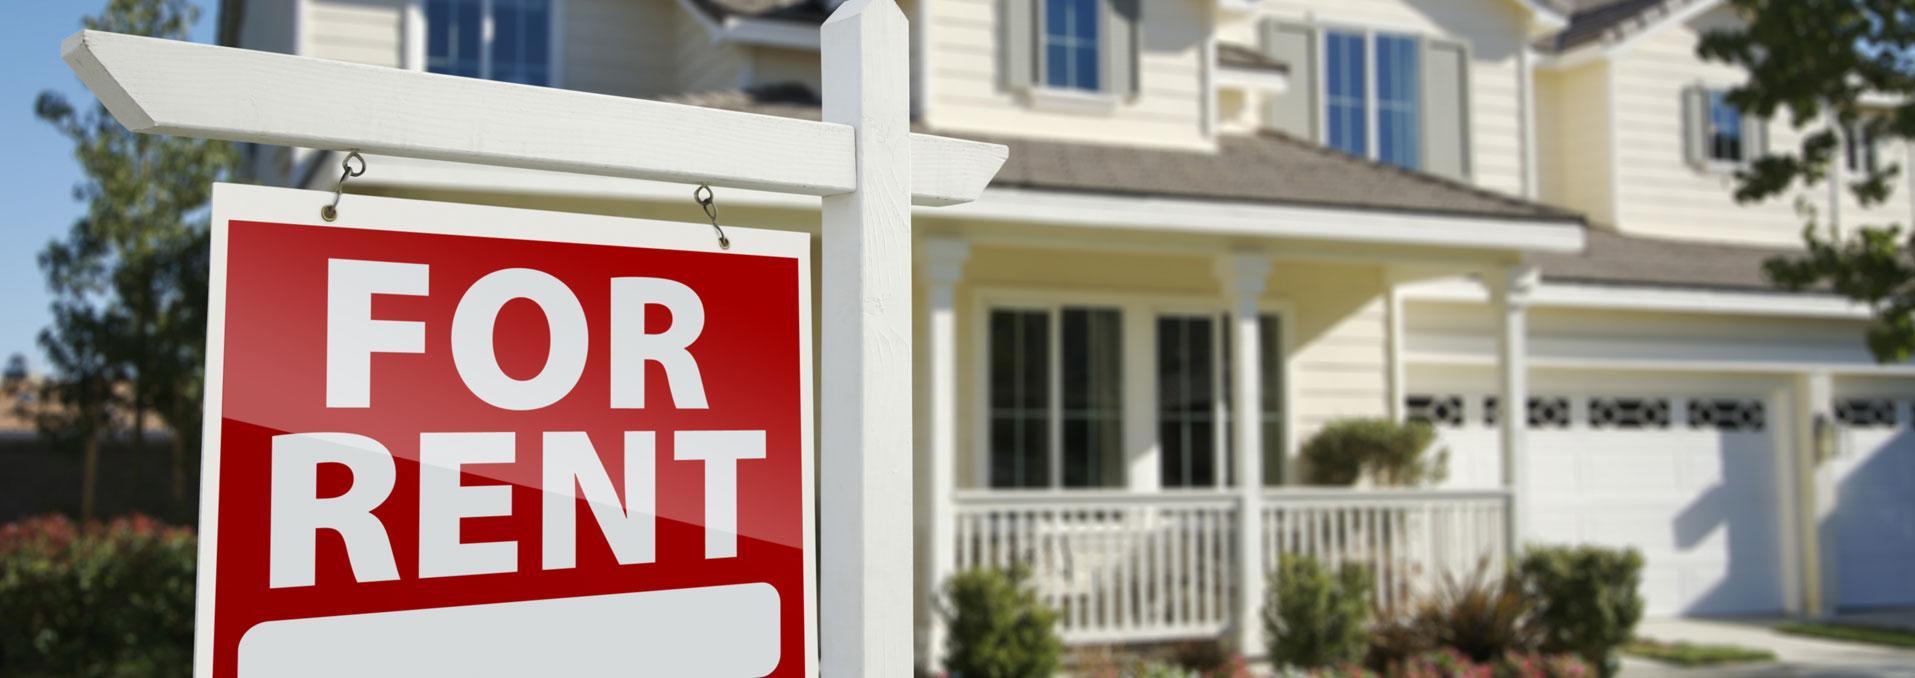 Rental Property Mortgage | Brampton Mortgage Broker - Rumy Gill